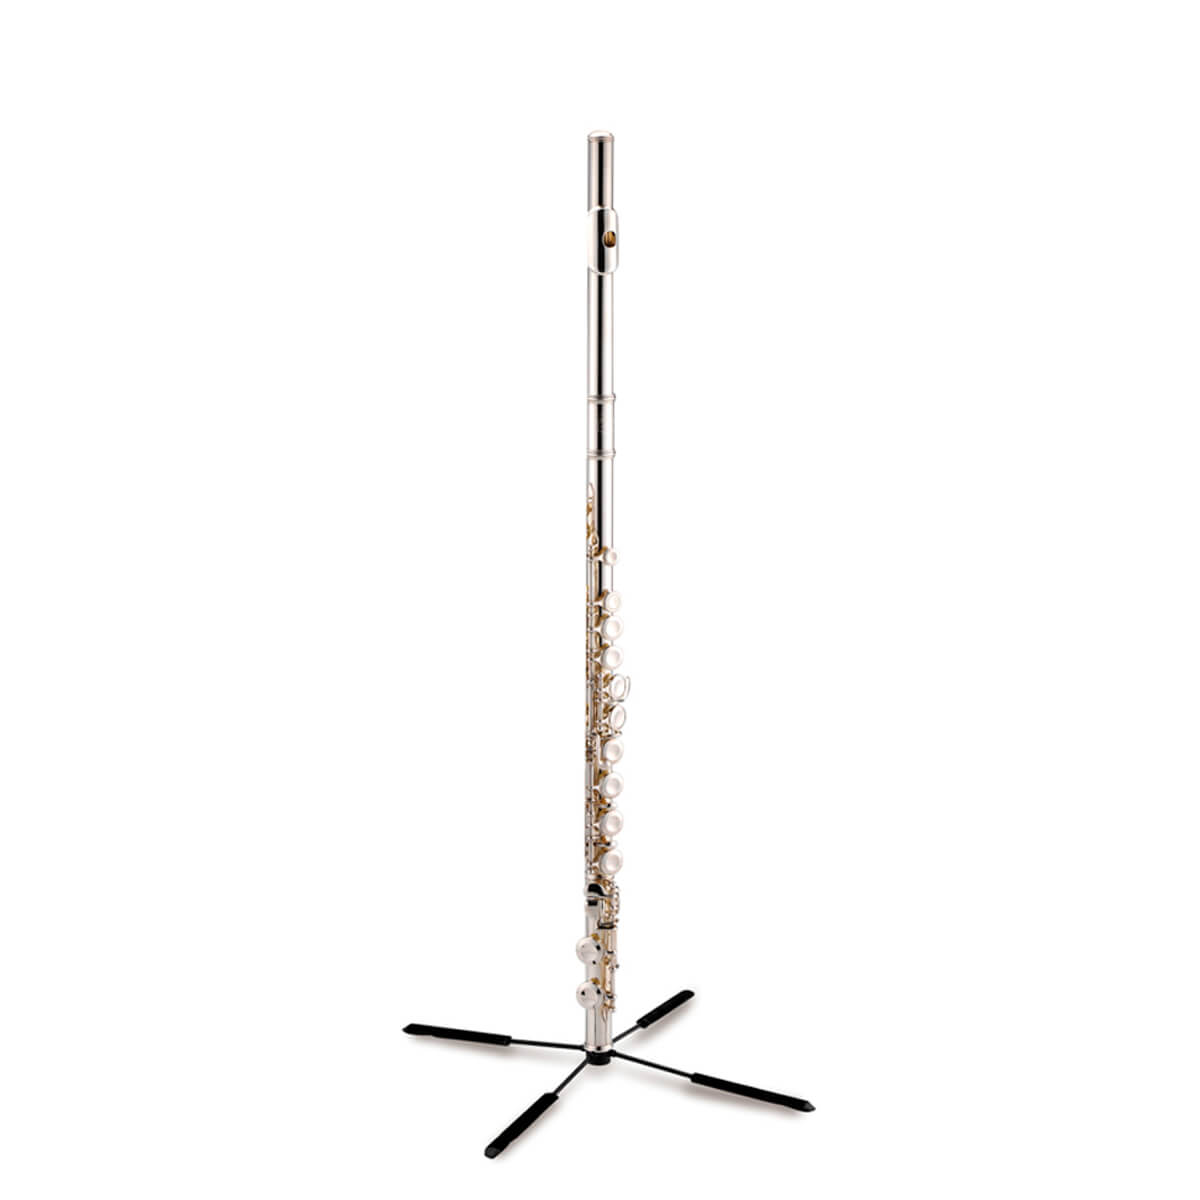 Suporte Para Flauta - Ds460b - Travlite - Hercules